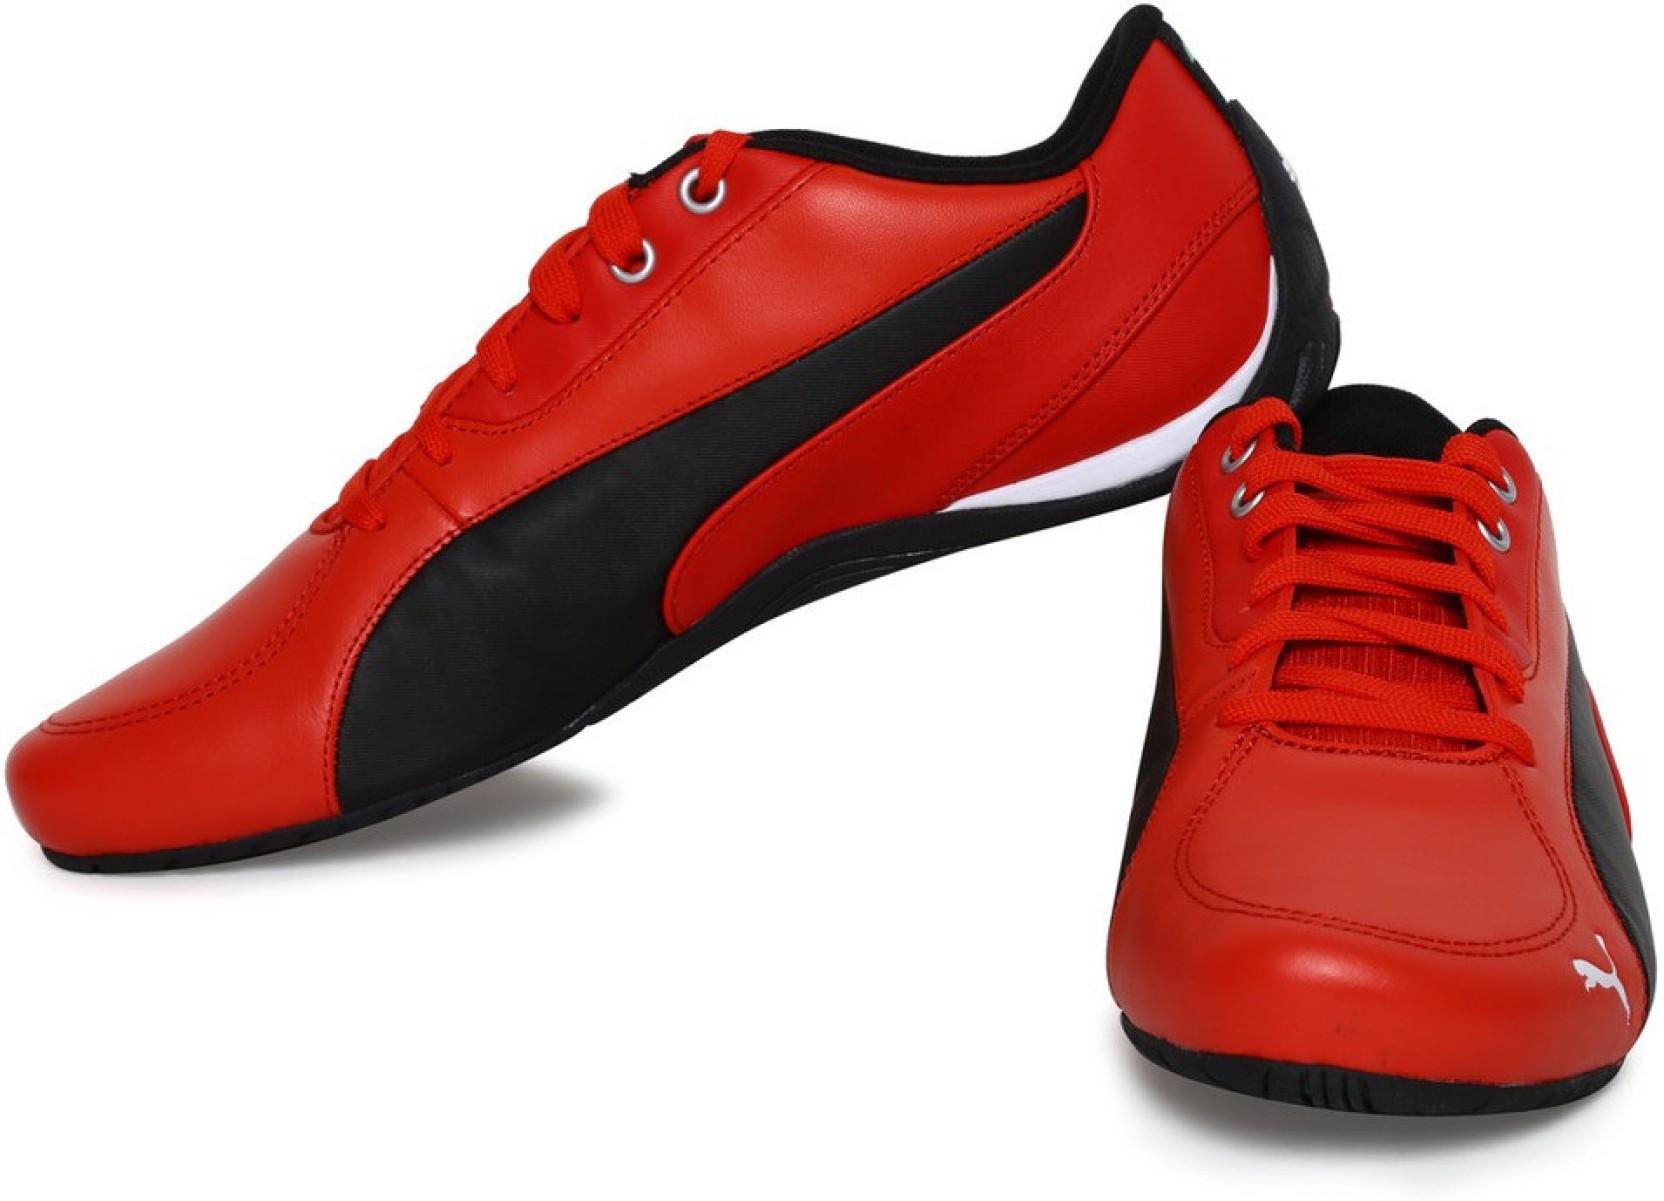 898ae8ccdeaa58 Puma Ferrari Drift Cat 5 SF NM 2 Motorsport Shoes For Men - Buy ...